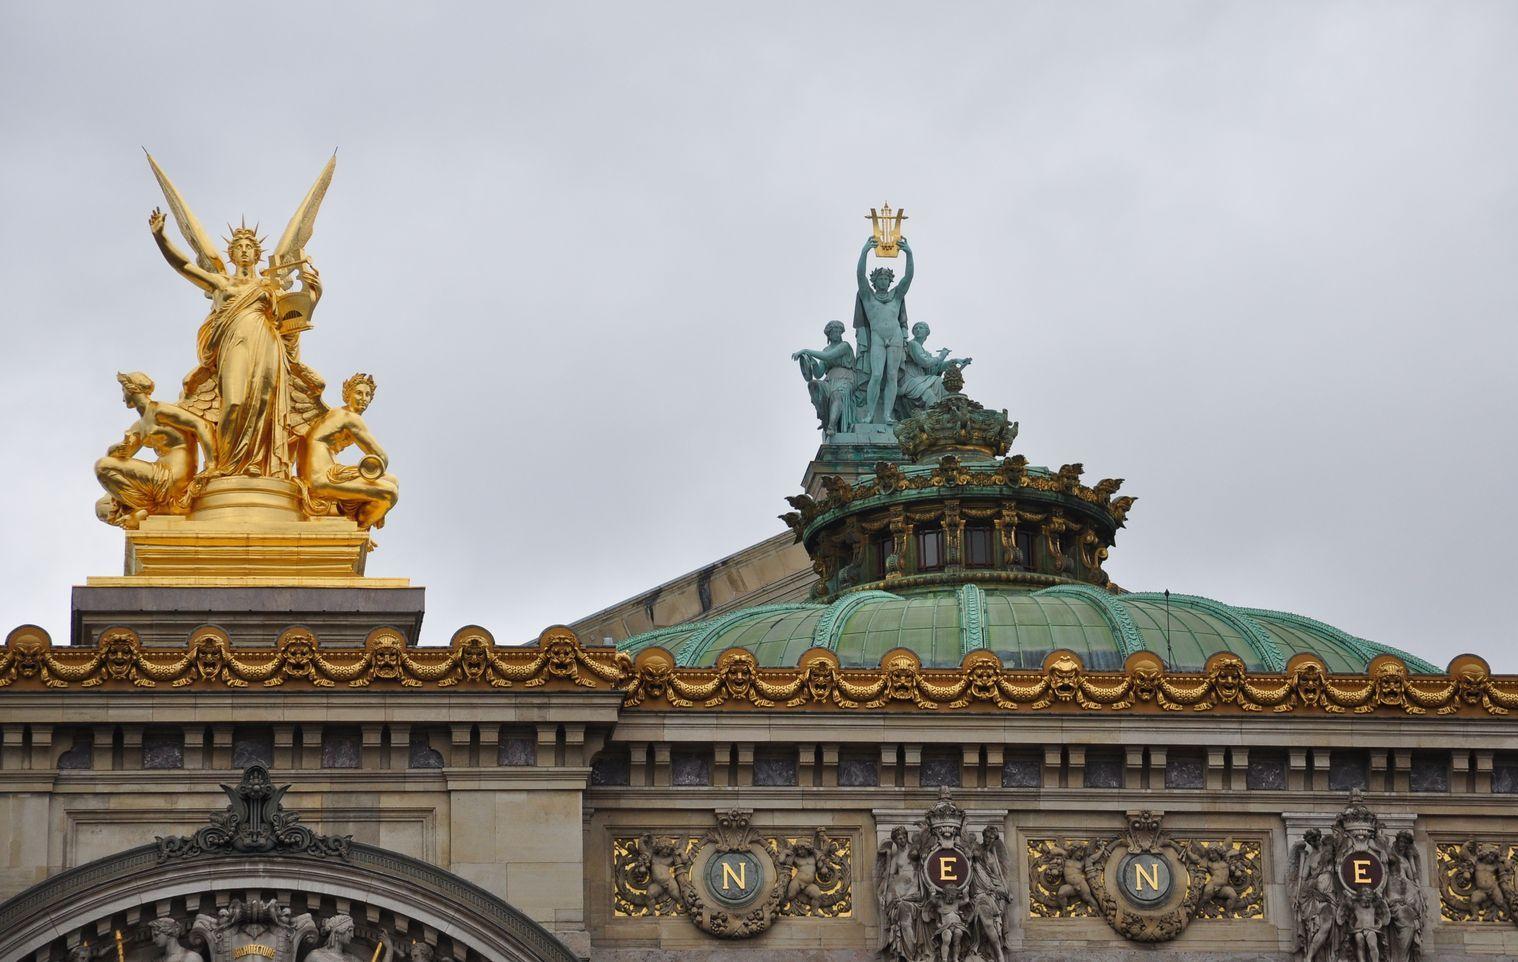 vestiaire de l'opera garnier | thumbs DSC 0510 Visite de lopéra Garnier